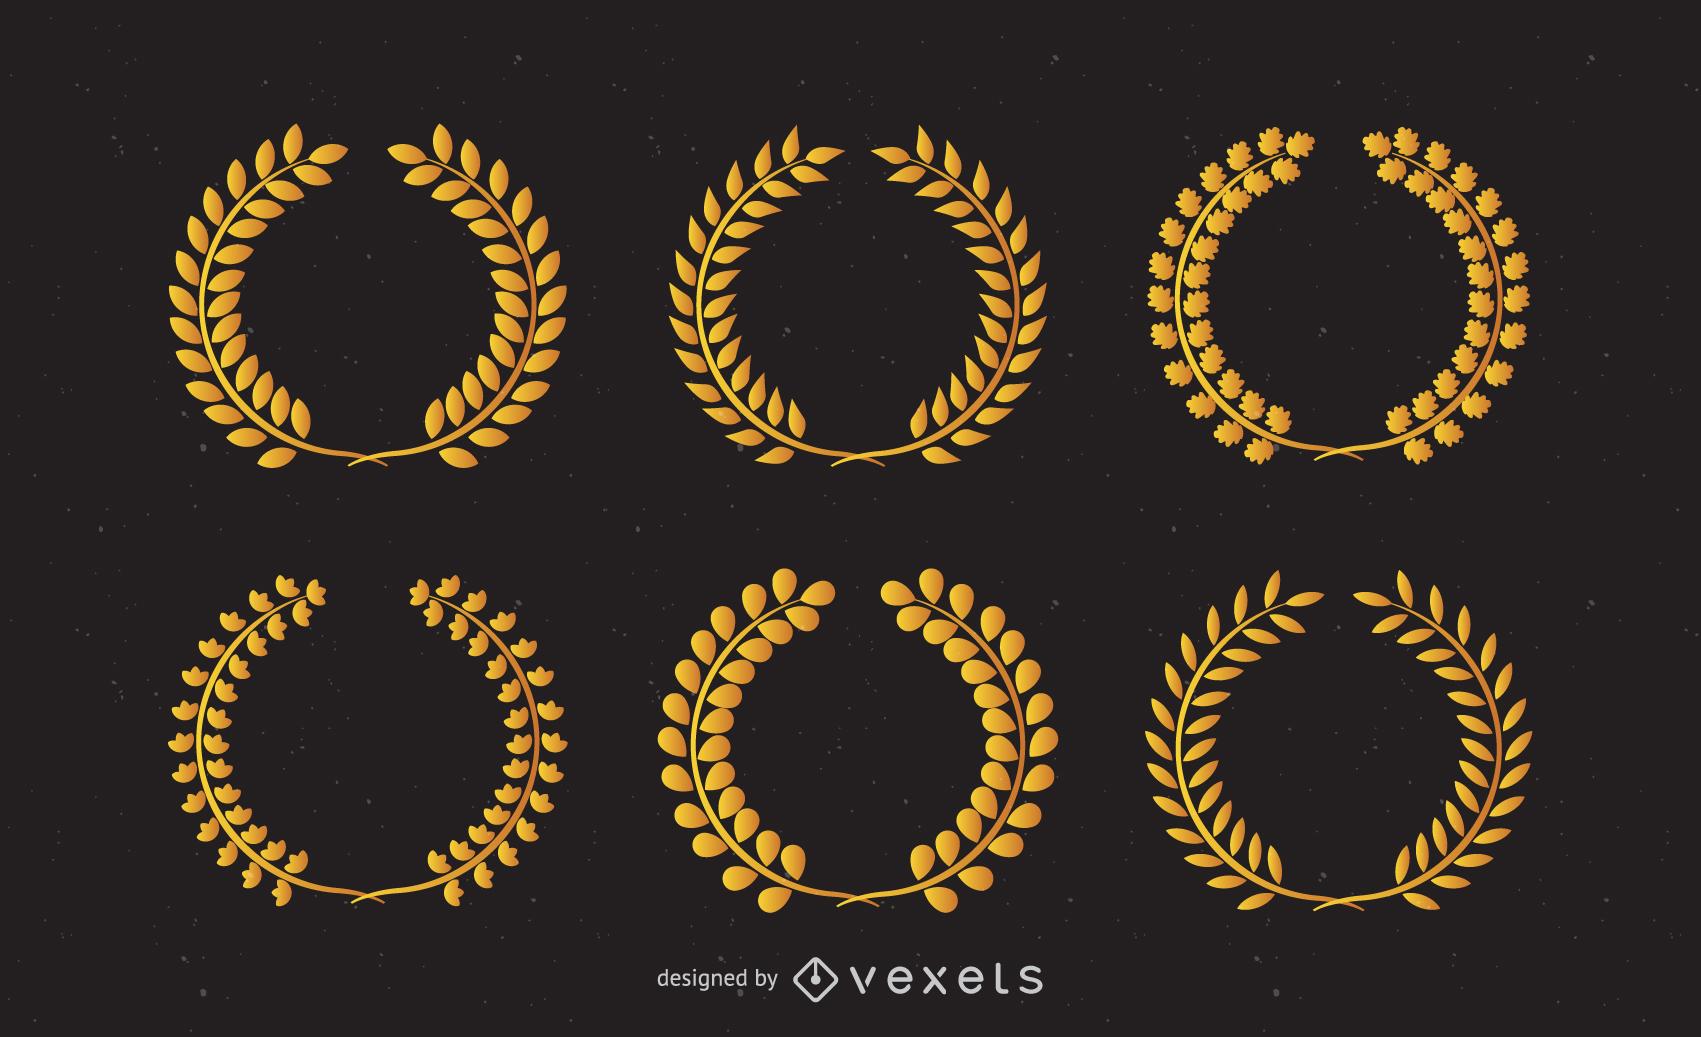 Corona de trigo de oro Vector Clip Wings - Descargar vector